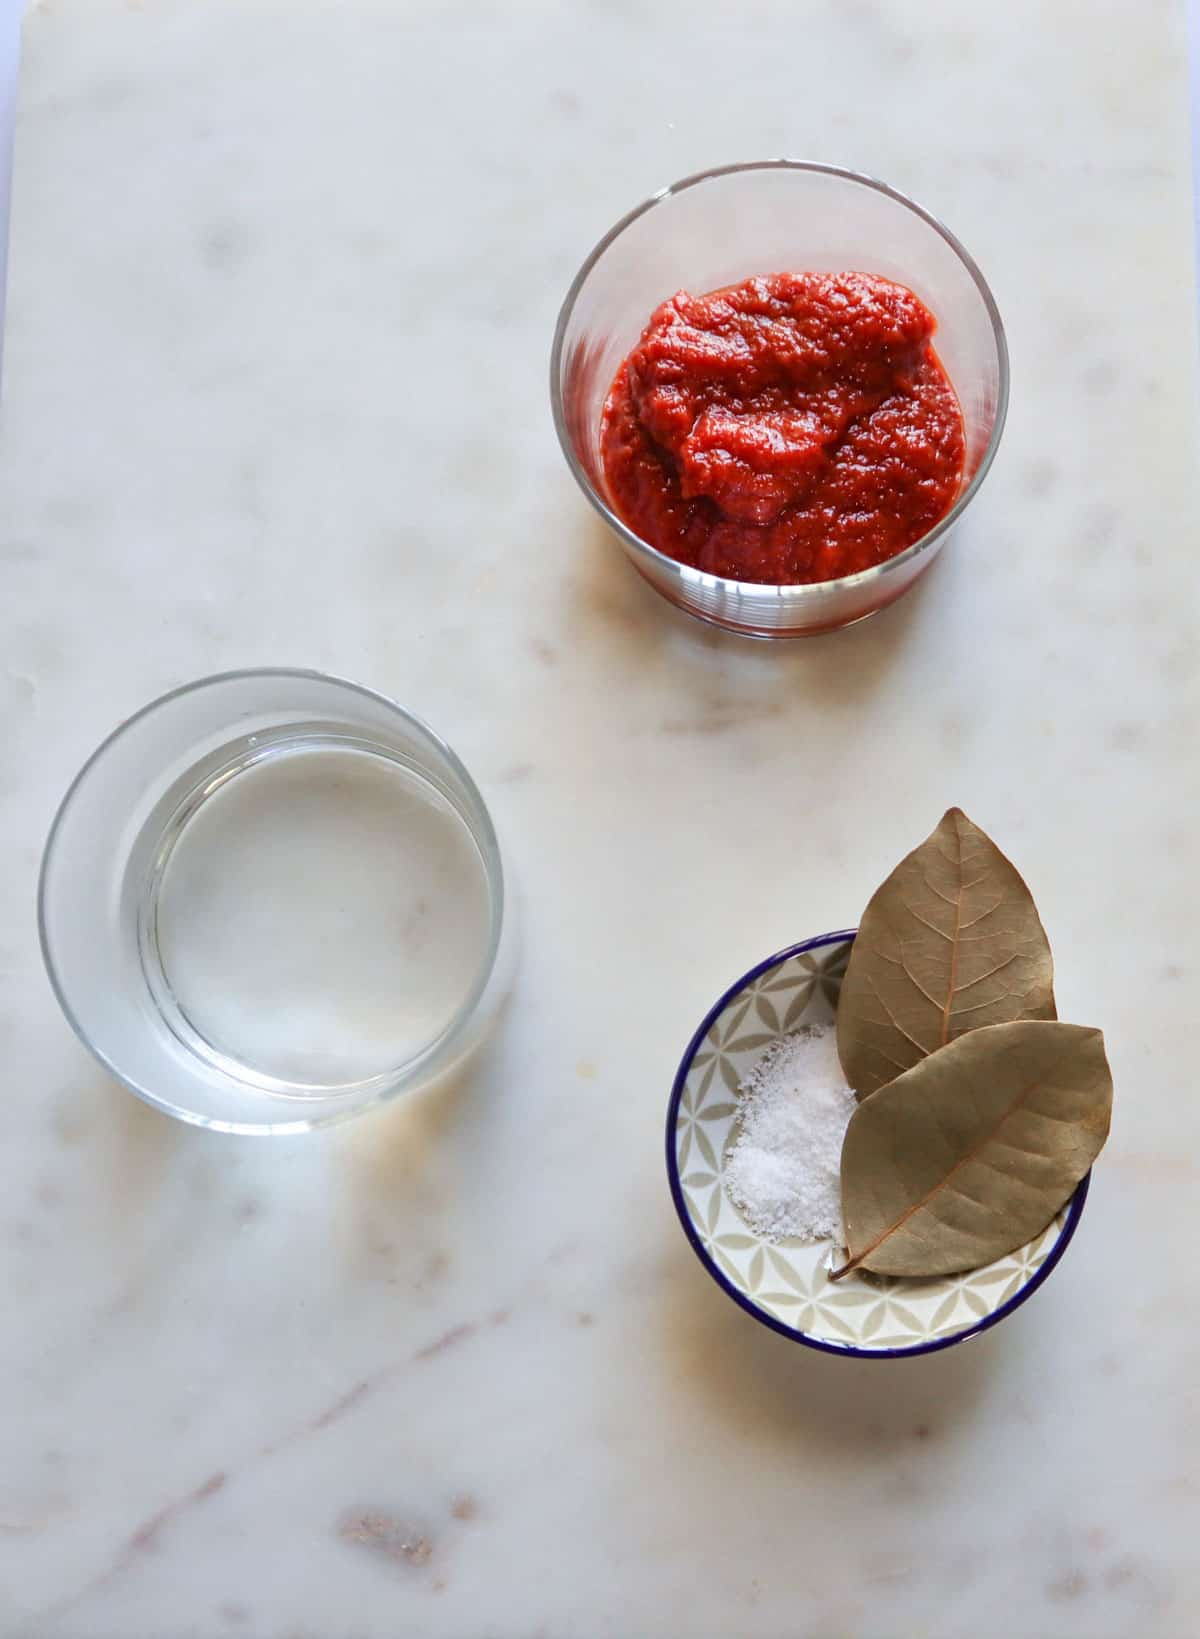 tomato paste, salt, and bay leaves